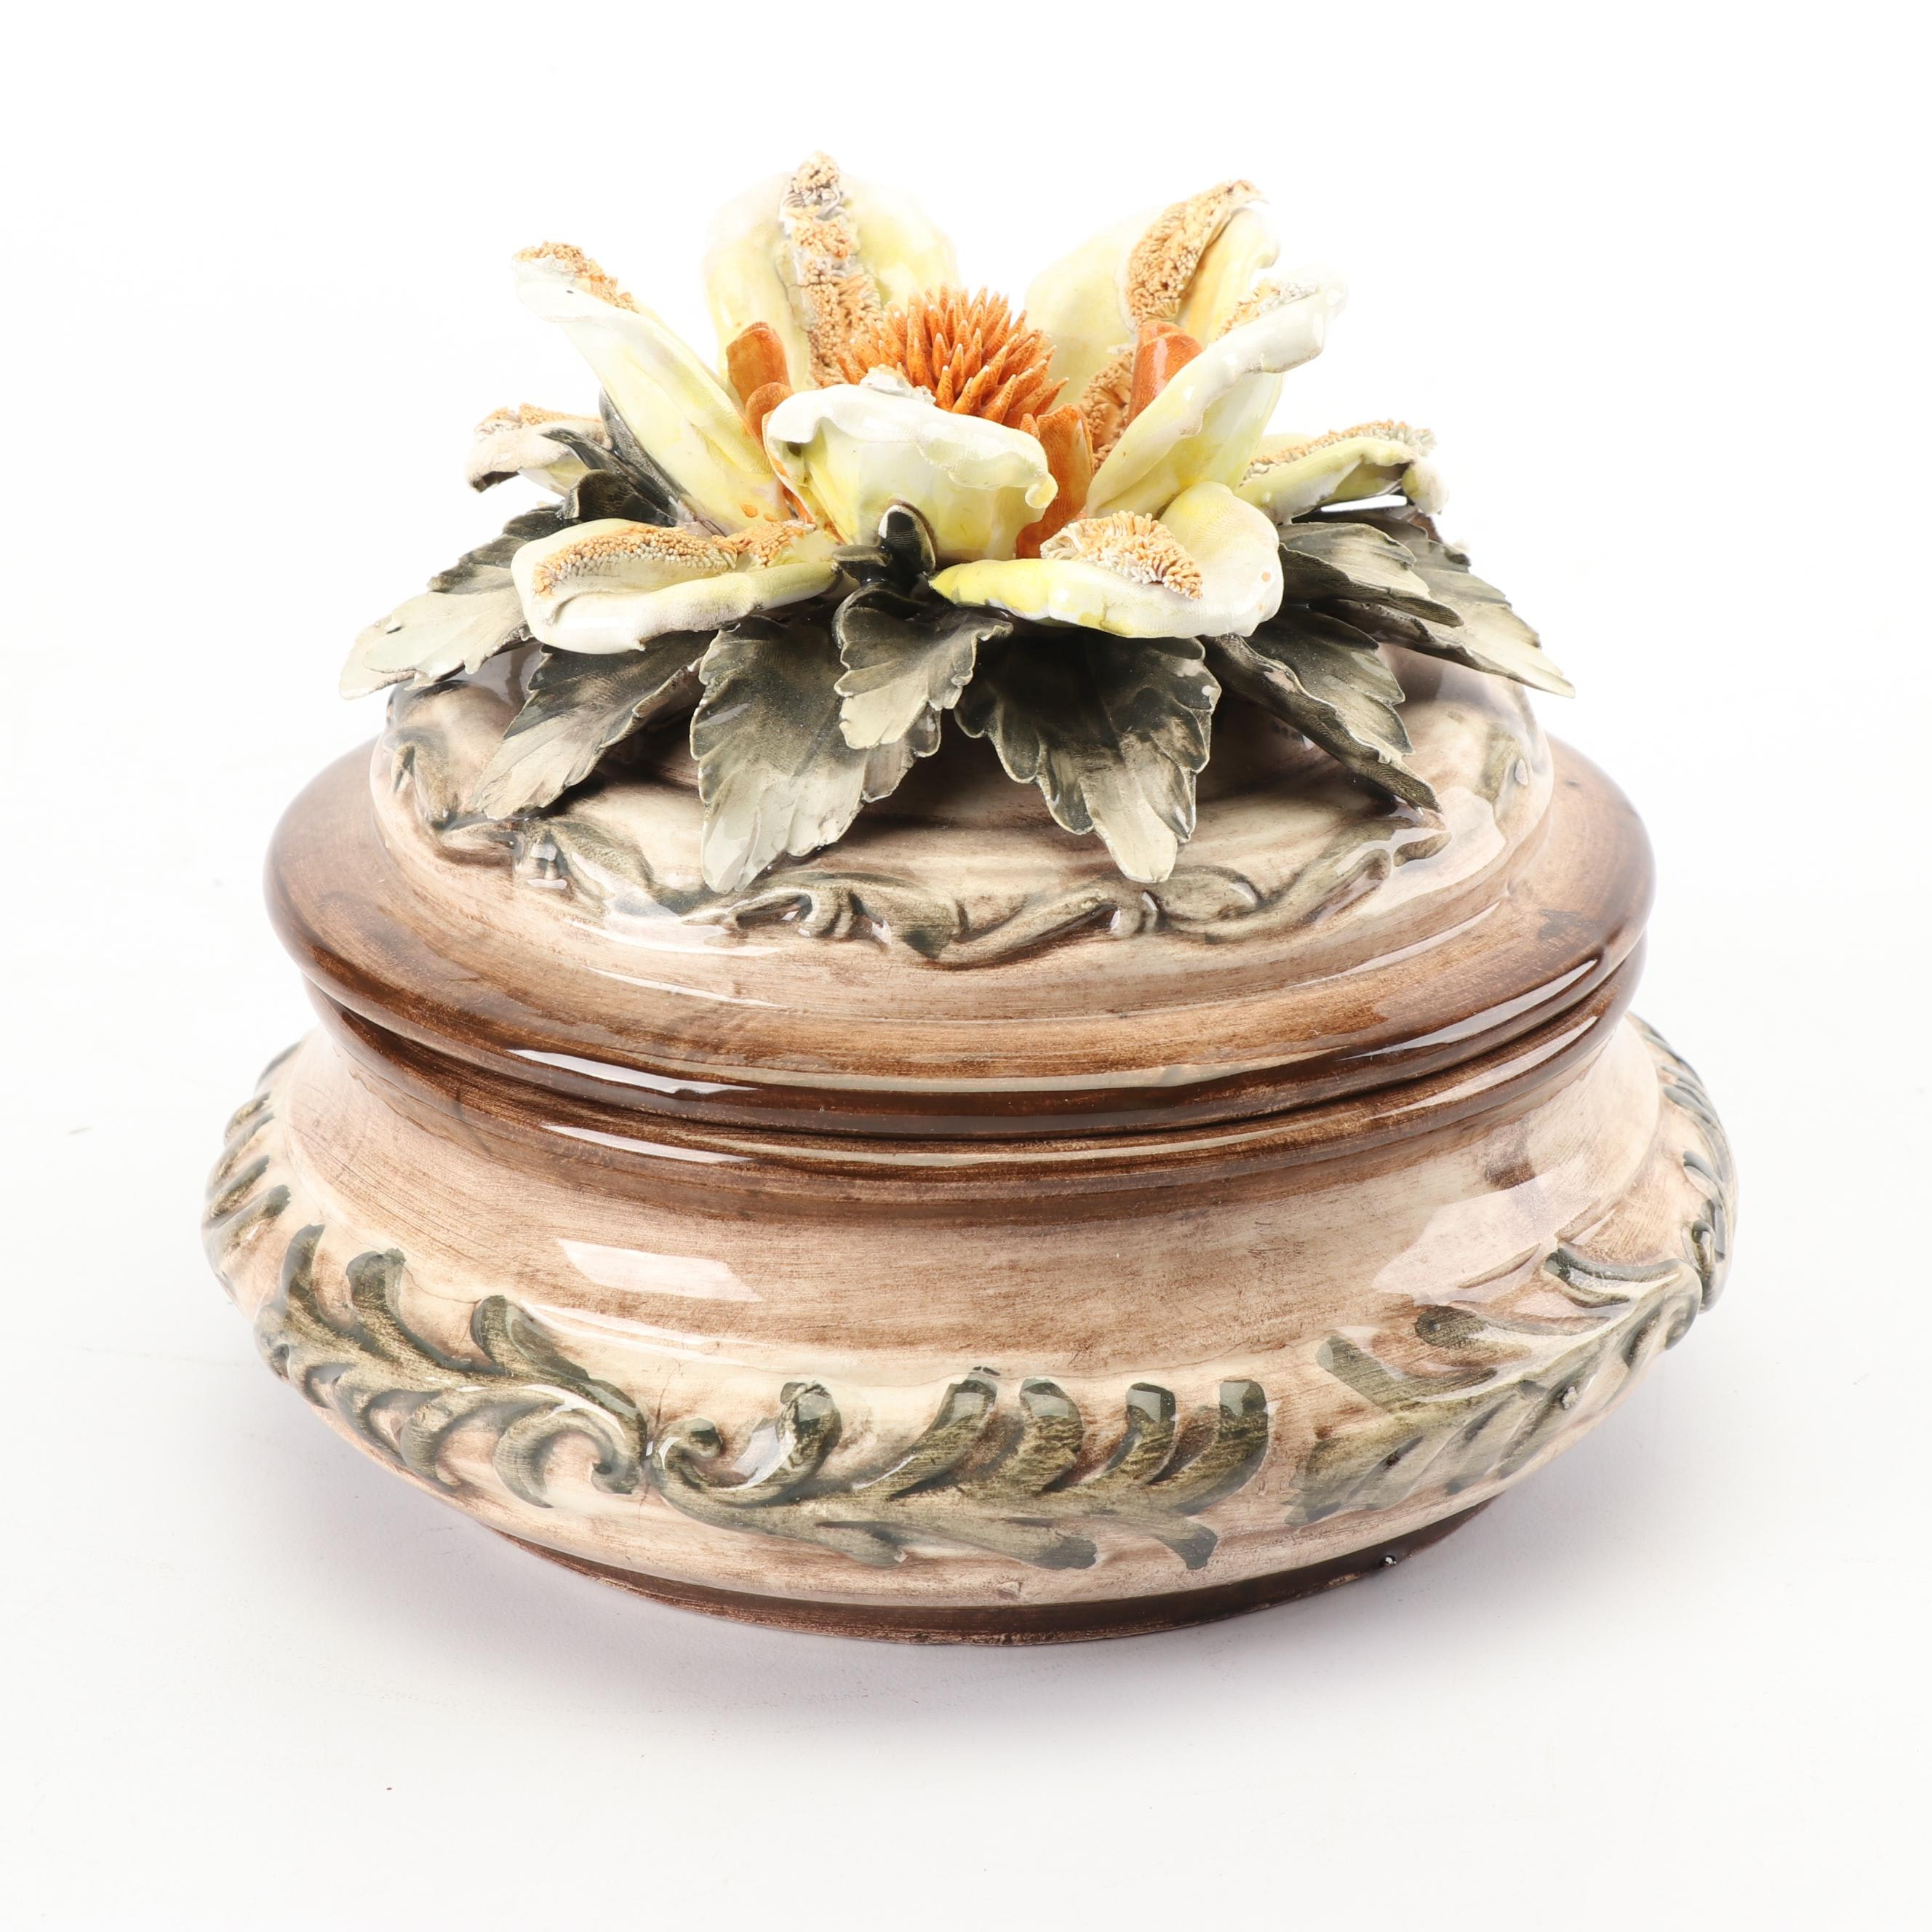 Italian Hand-Painted Capodimonte Style Ceramic Trinket Box